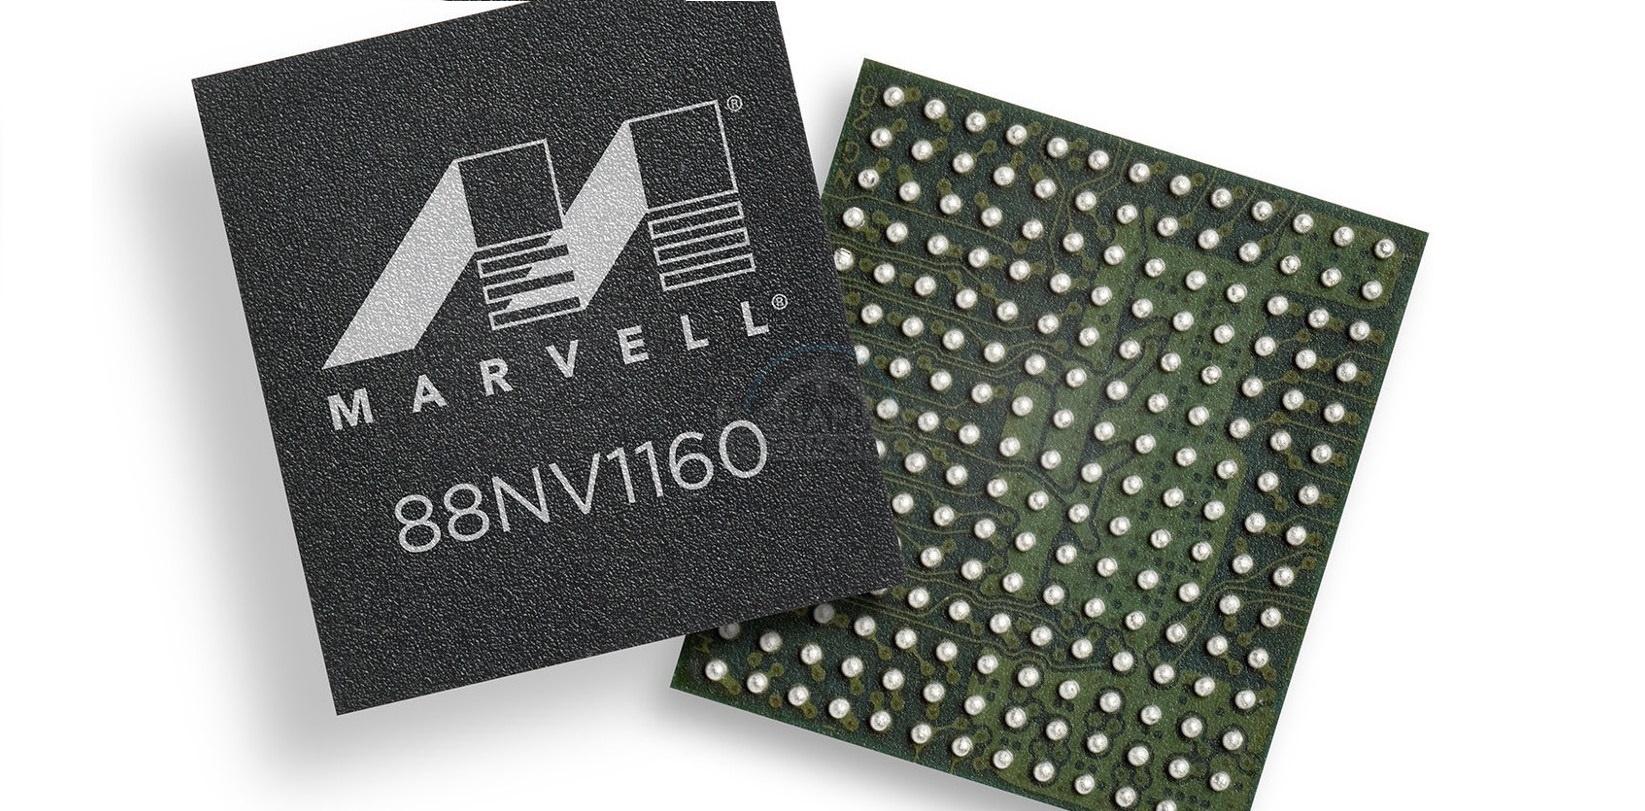 Marvell 88NV1160: Controladora para SSDs con lecturas de hasta 1600 MB/s